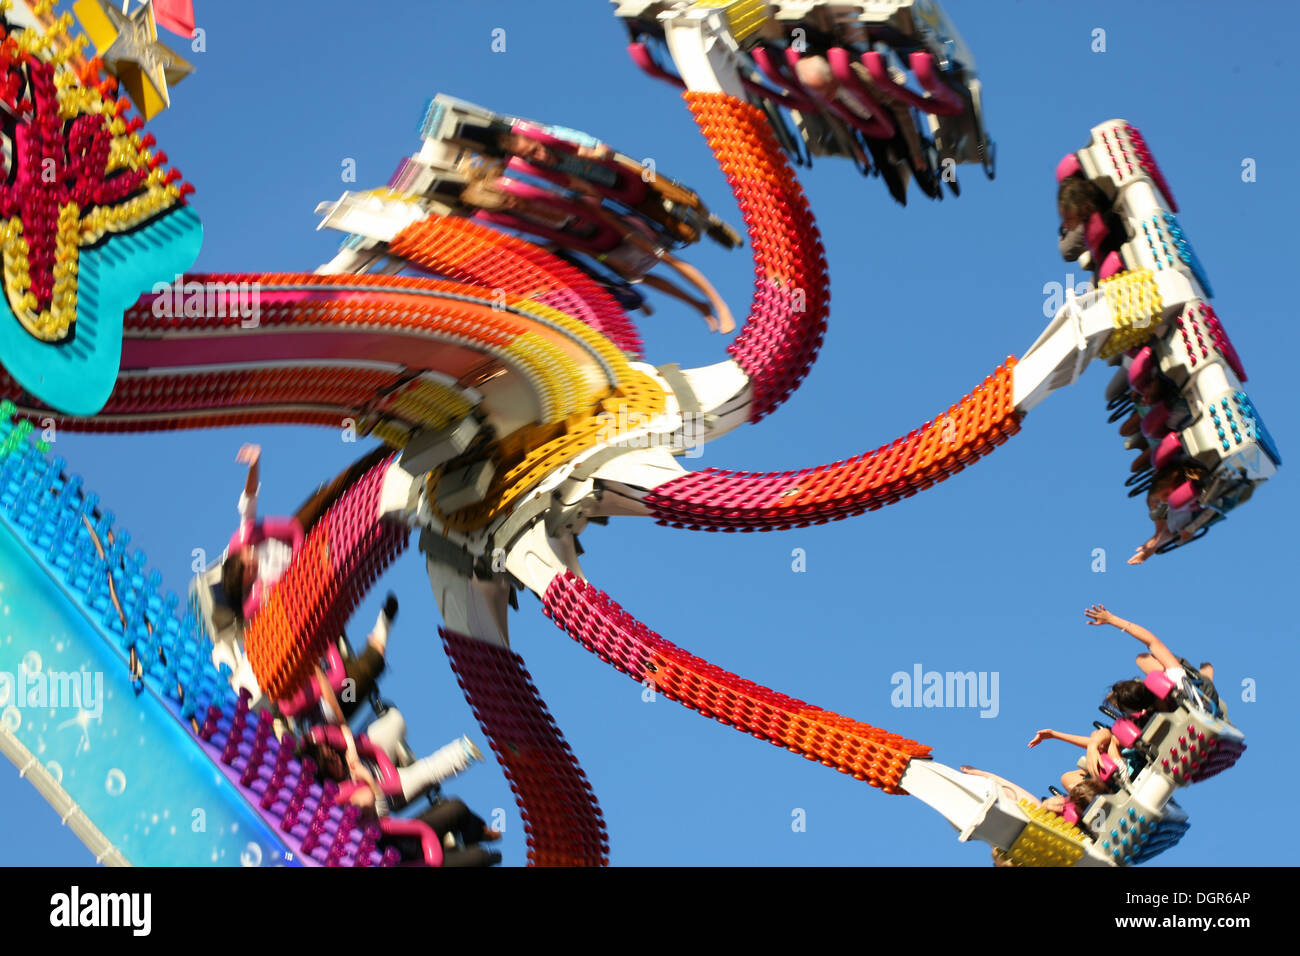 Oktoberfest; Looping - Stock Image